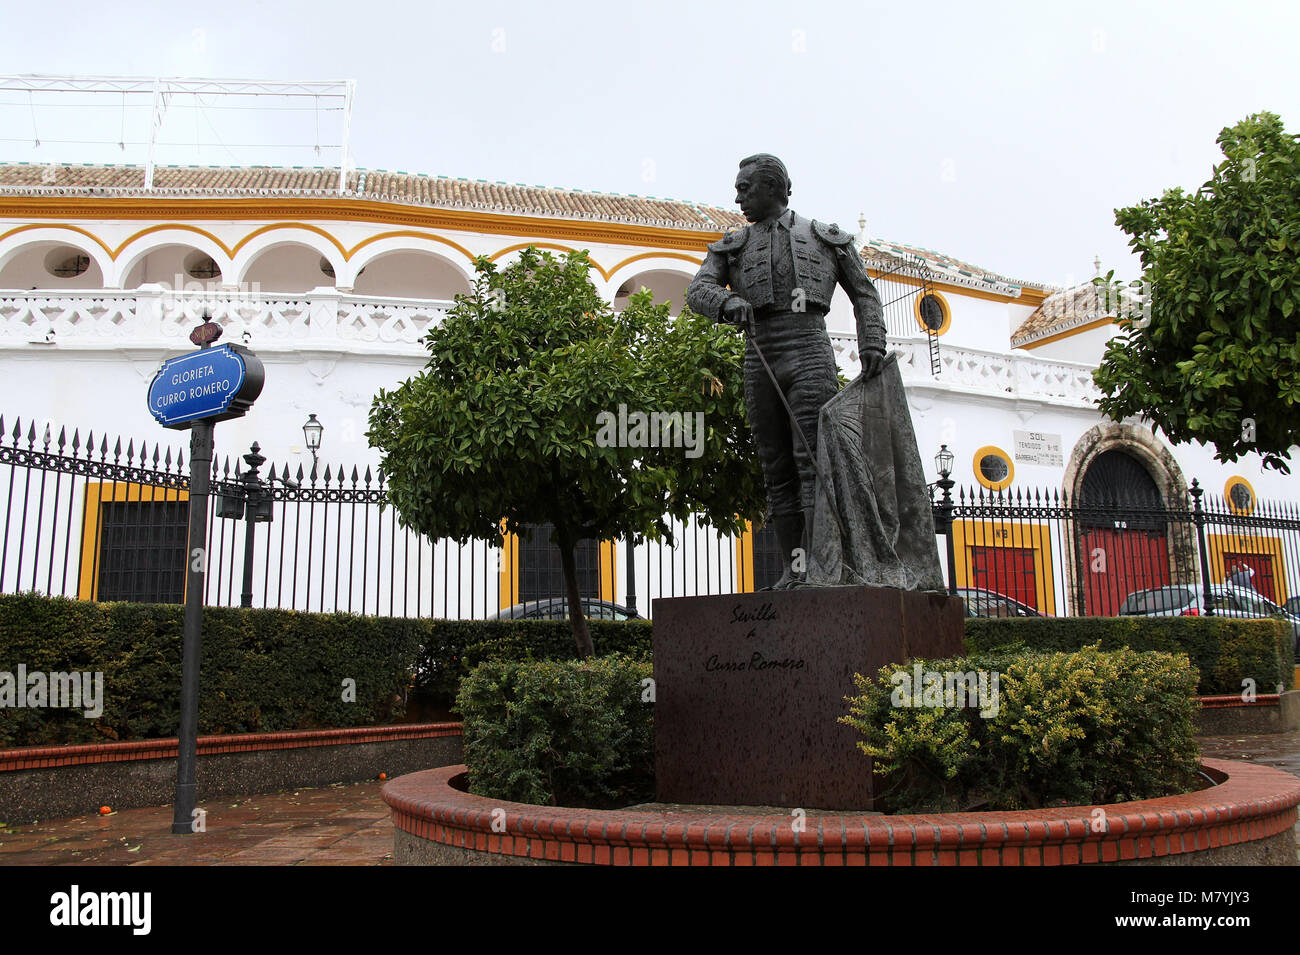 Bronze statue of Curro Romero at Seville Bullring - Stock Image